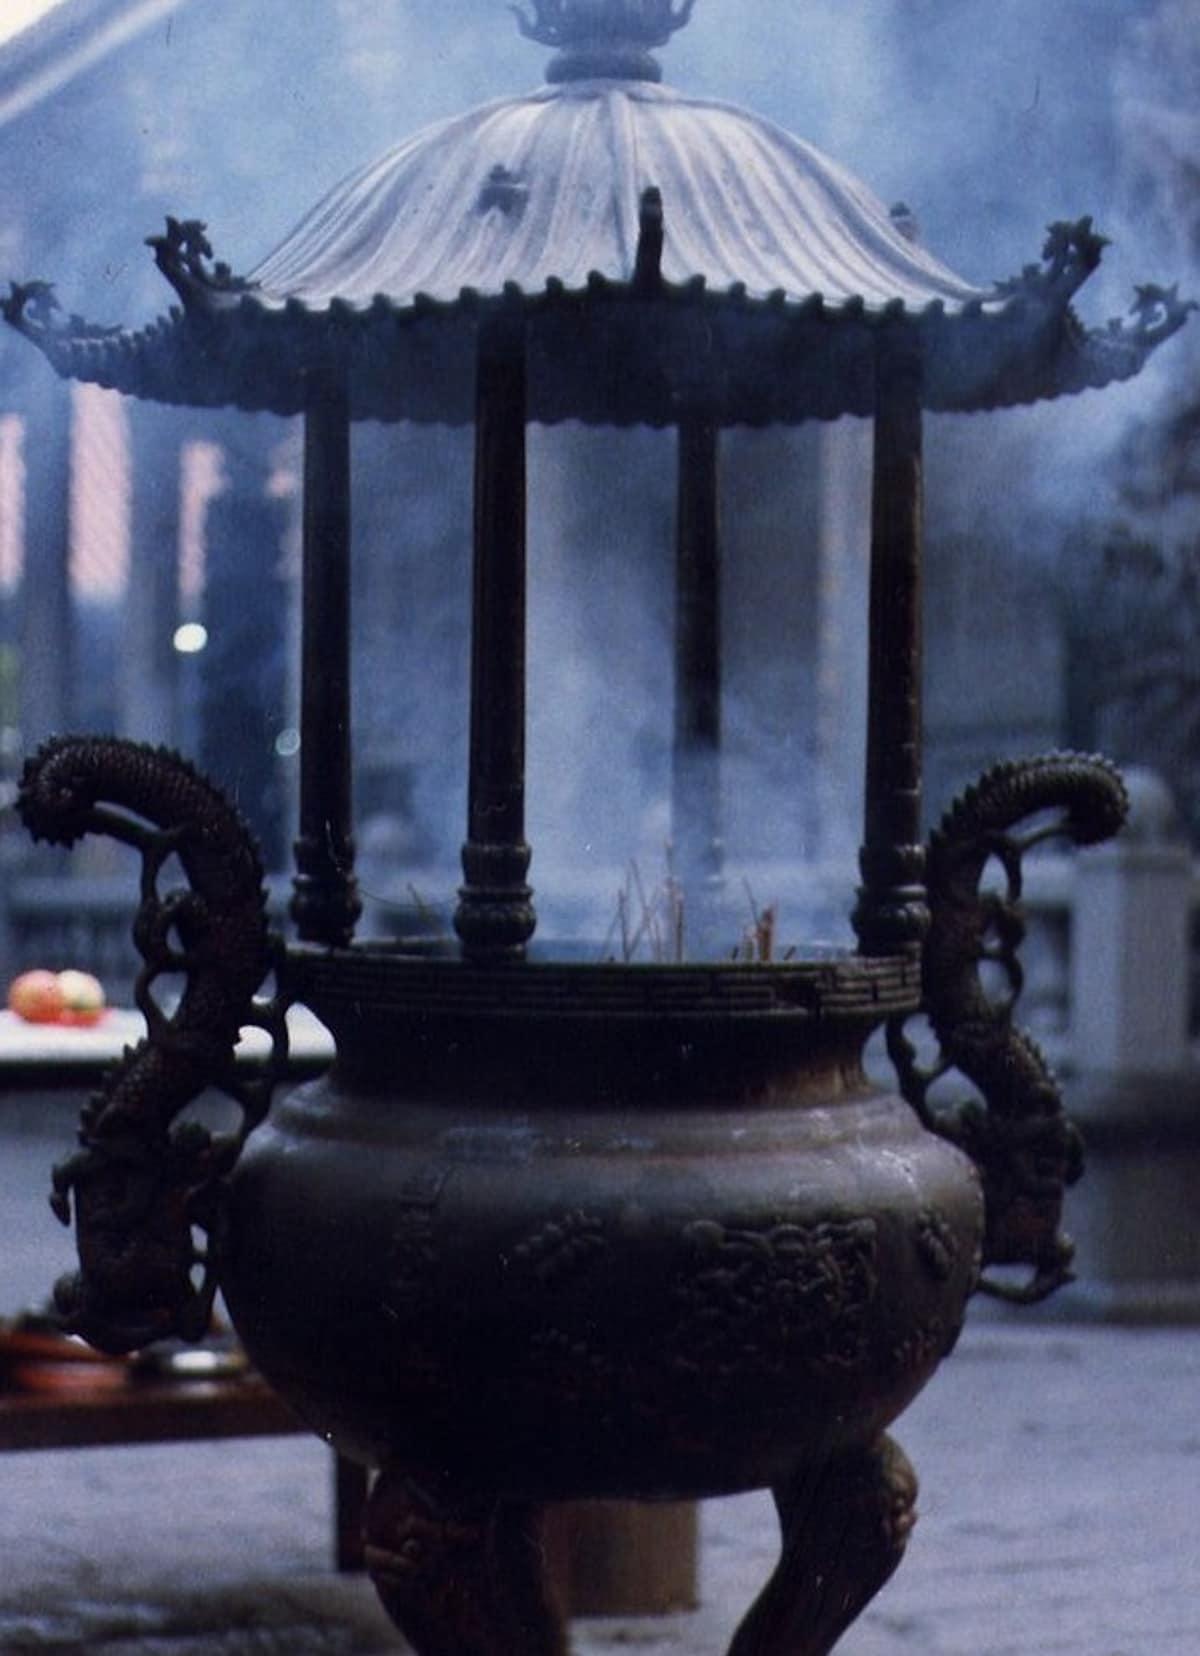 3. Incense Etiquette in a Temple